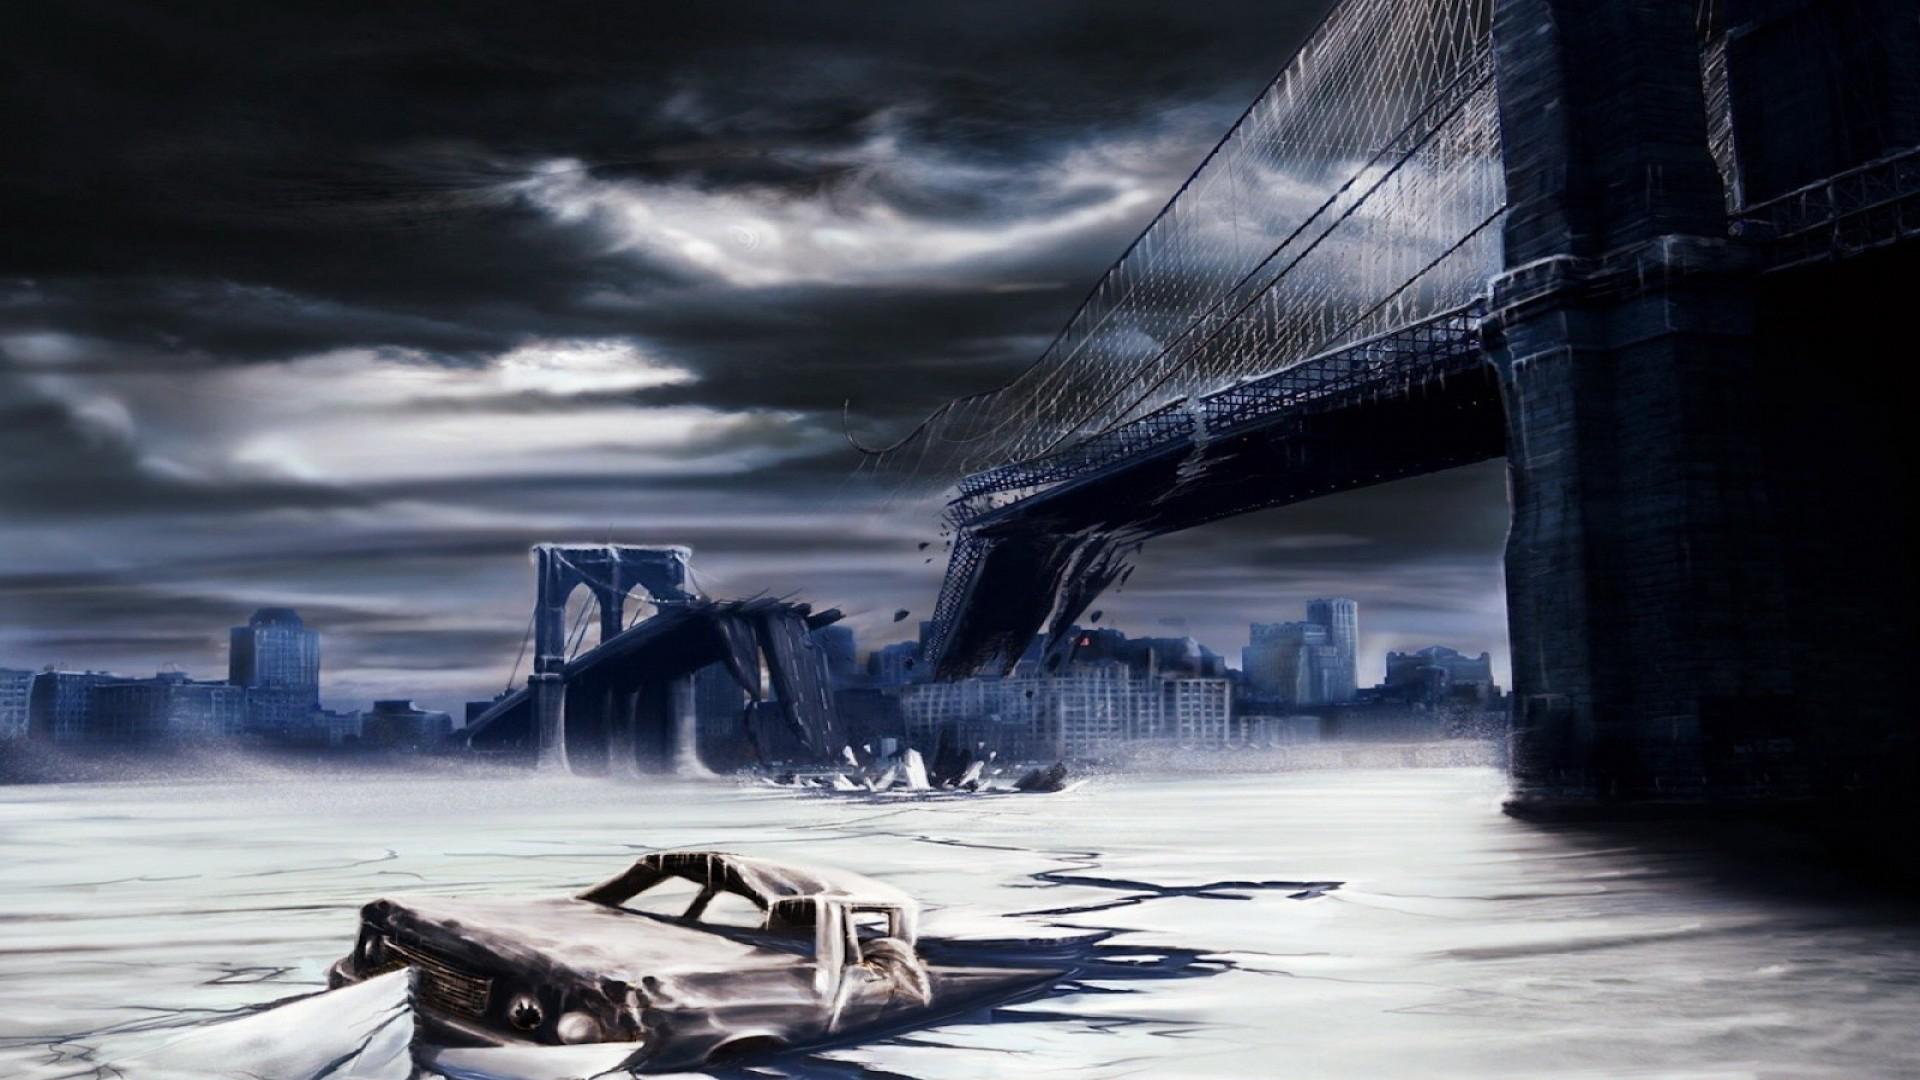 Sci Fi - Post Apocalyptic  Golden Gate Bridge Wallpaper